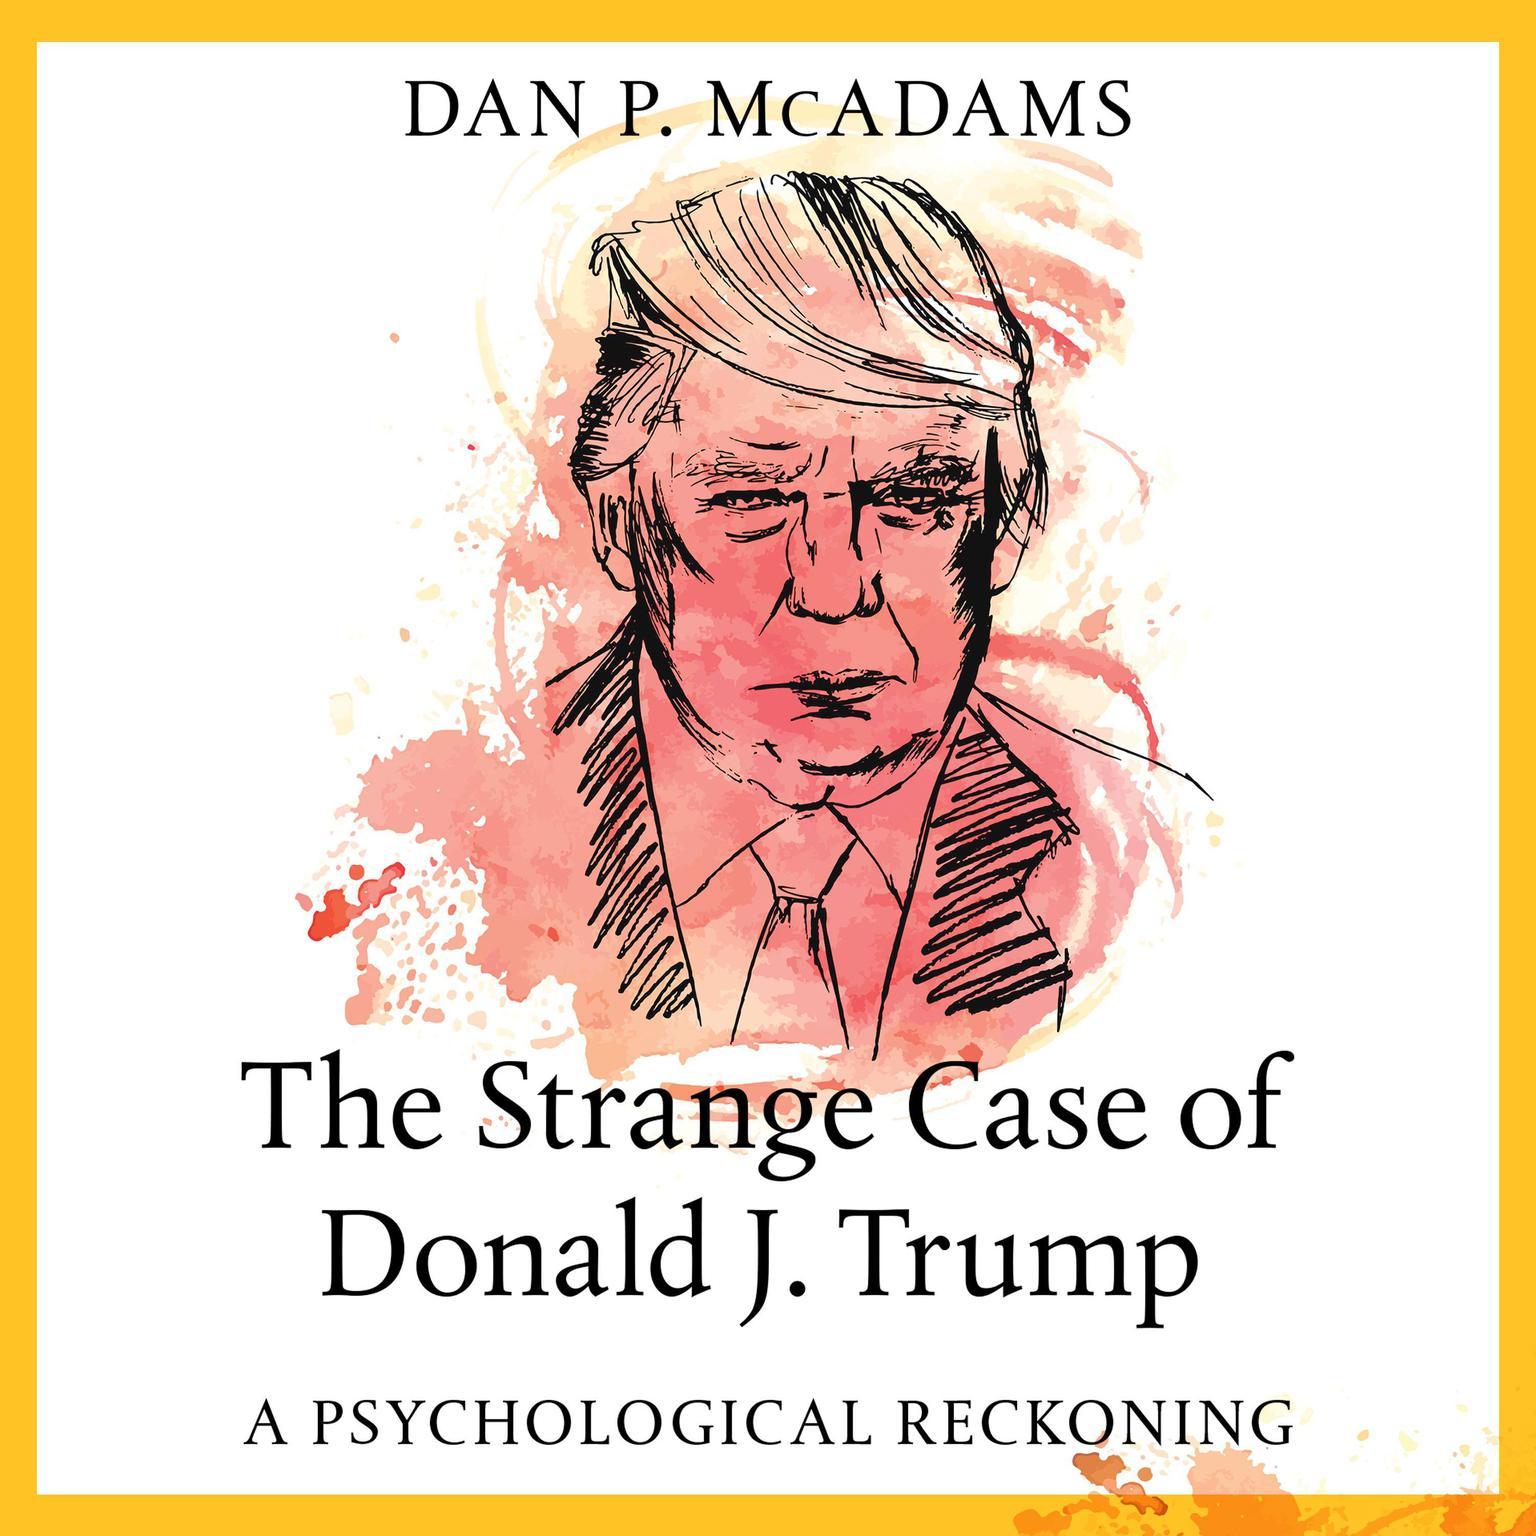 The Strange Case of Donald J. Trump: A Psychological Reckoning Audiobook, by Dan P. McAdams